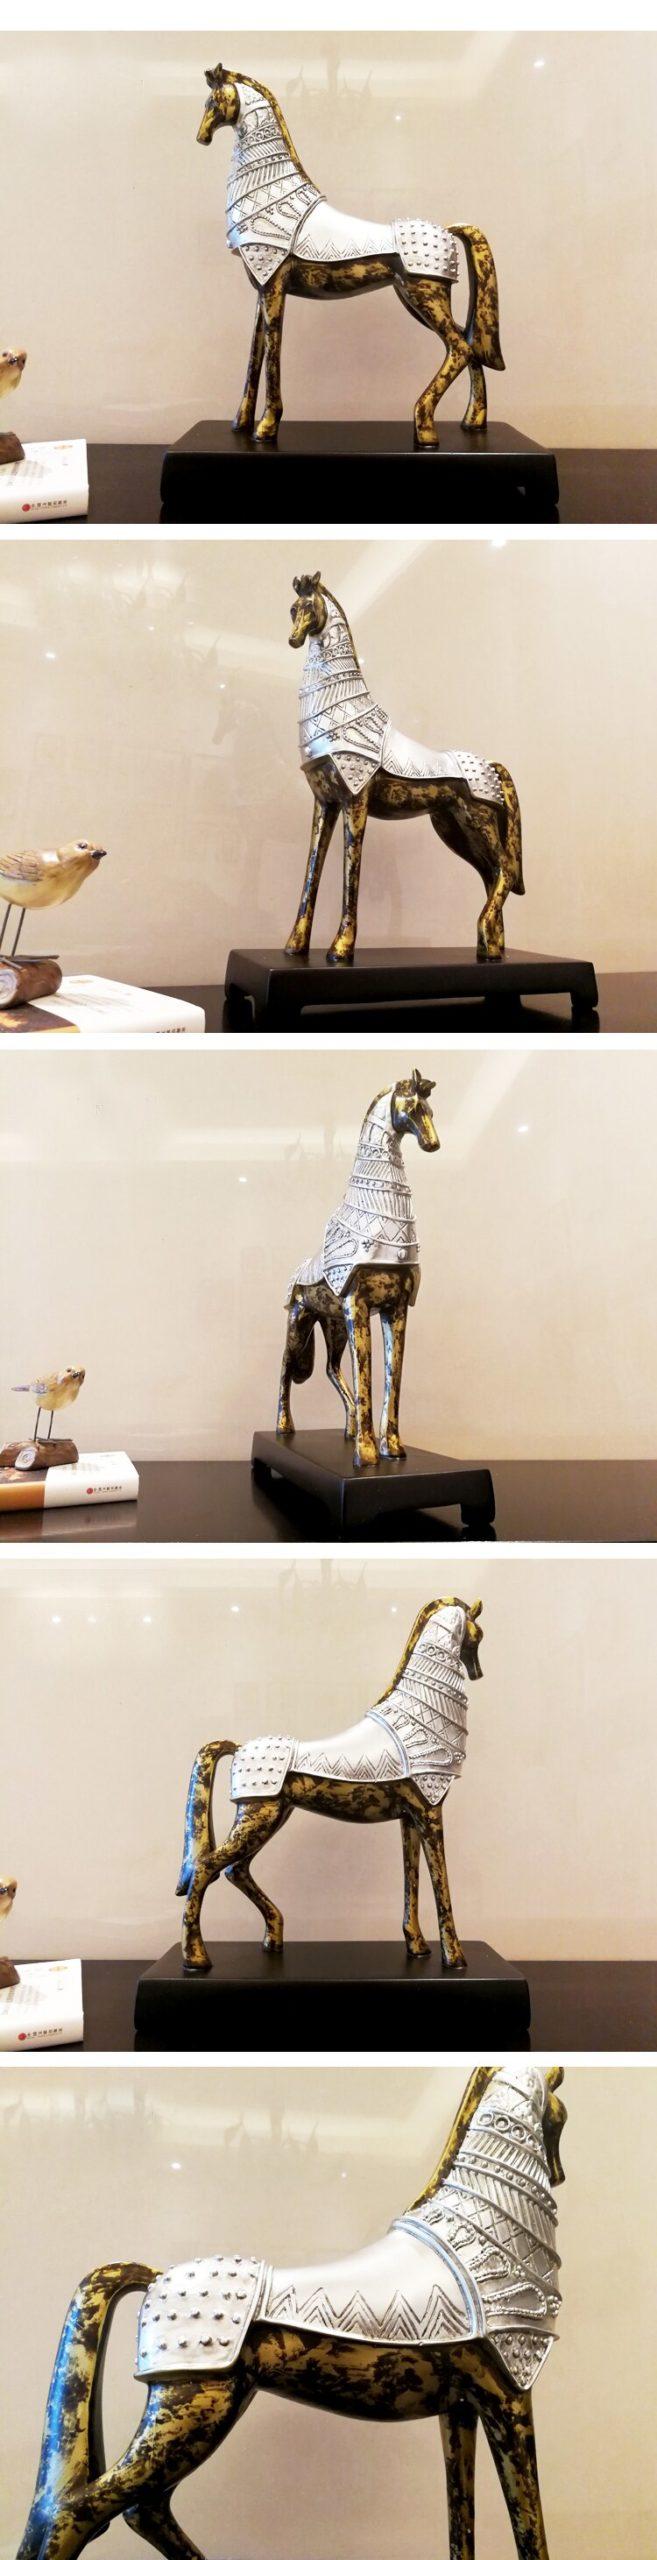 Retro Medieval War Horse Ornaments Resin Armored Horse Desk Decor Black Base European Vintage Home Decoration Accessories